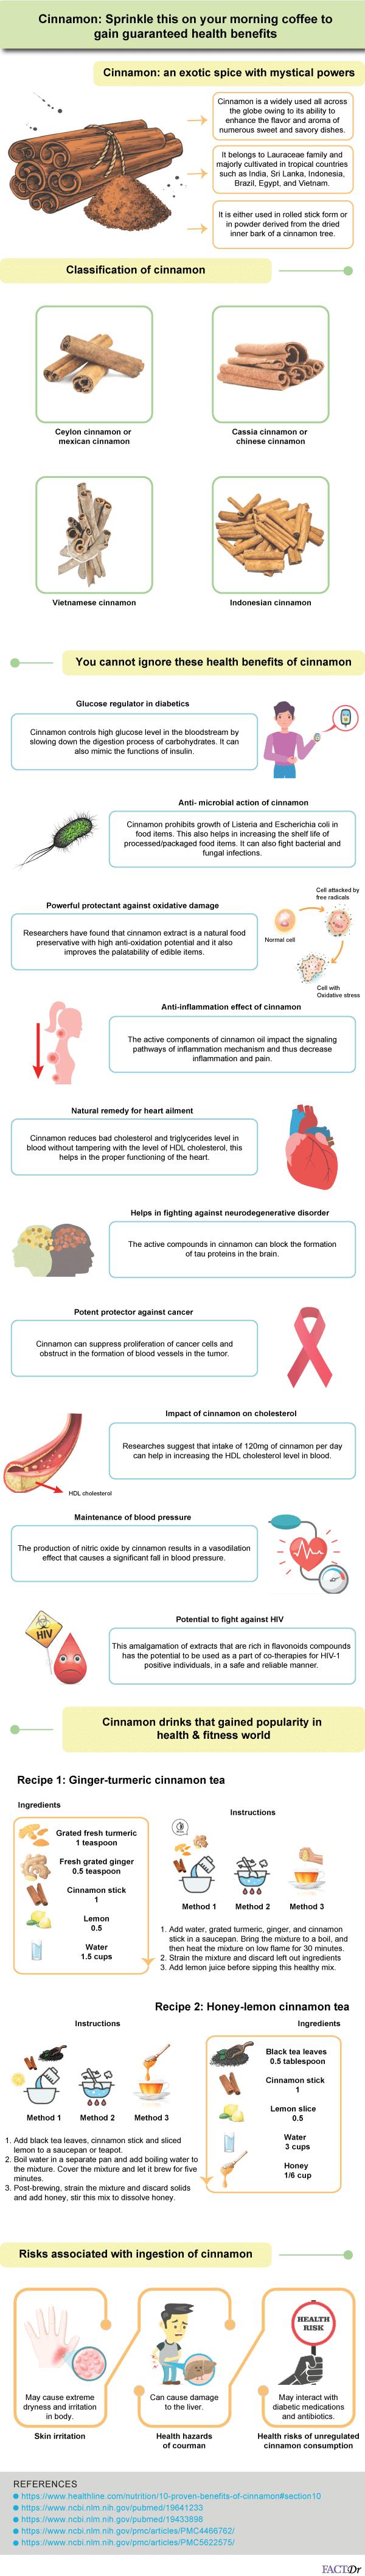 Cinnamon-infographic